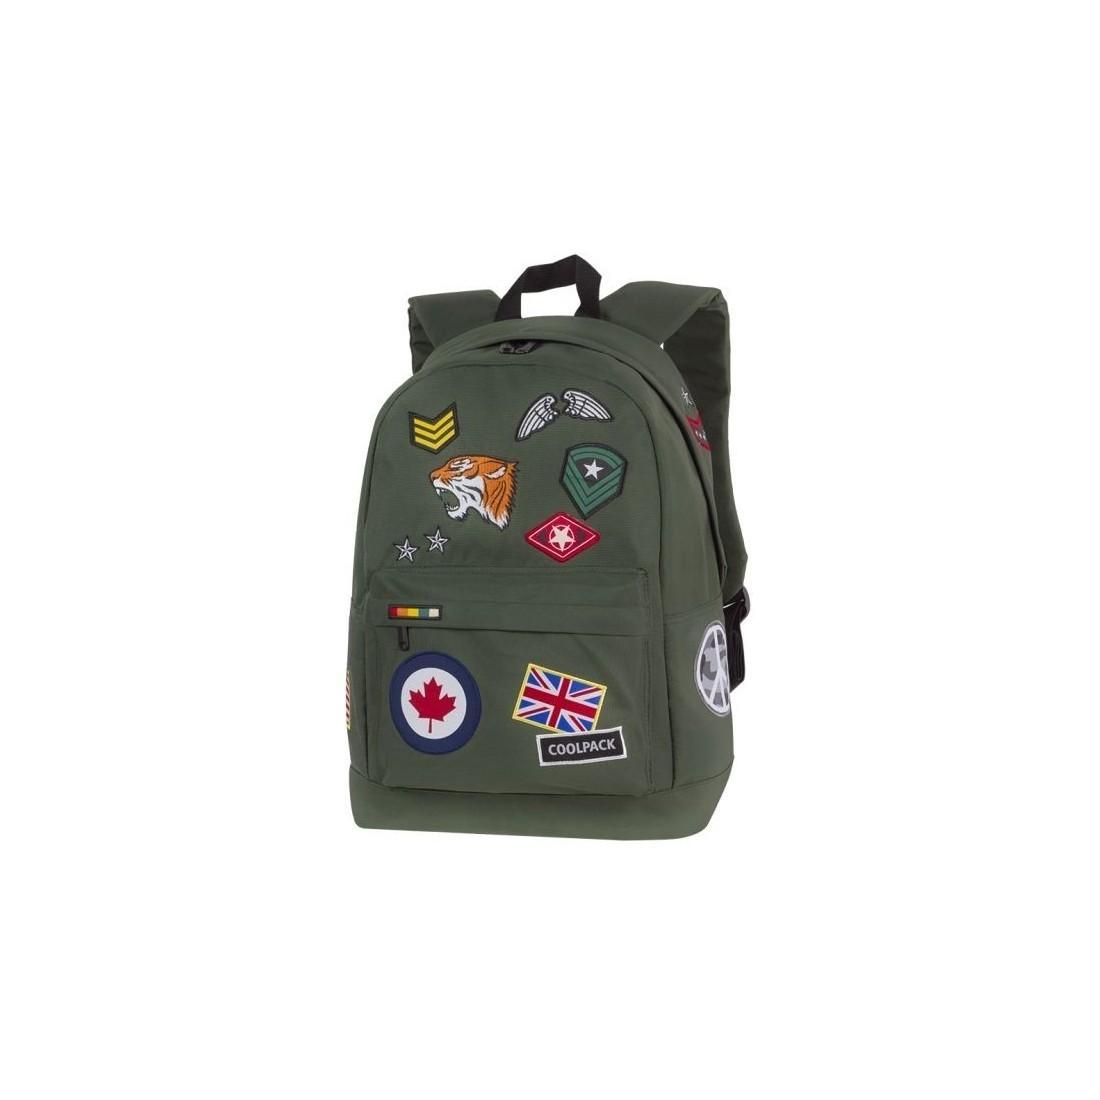 8739c139b49e9 Plecak szkolny CoolPack CP BENTLEY BADGES GREEN zielony z wszywkami ...